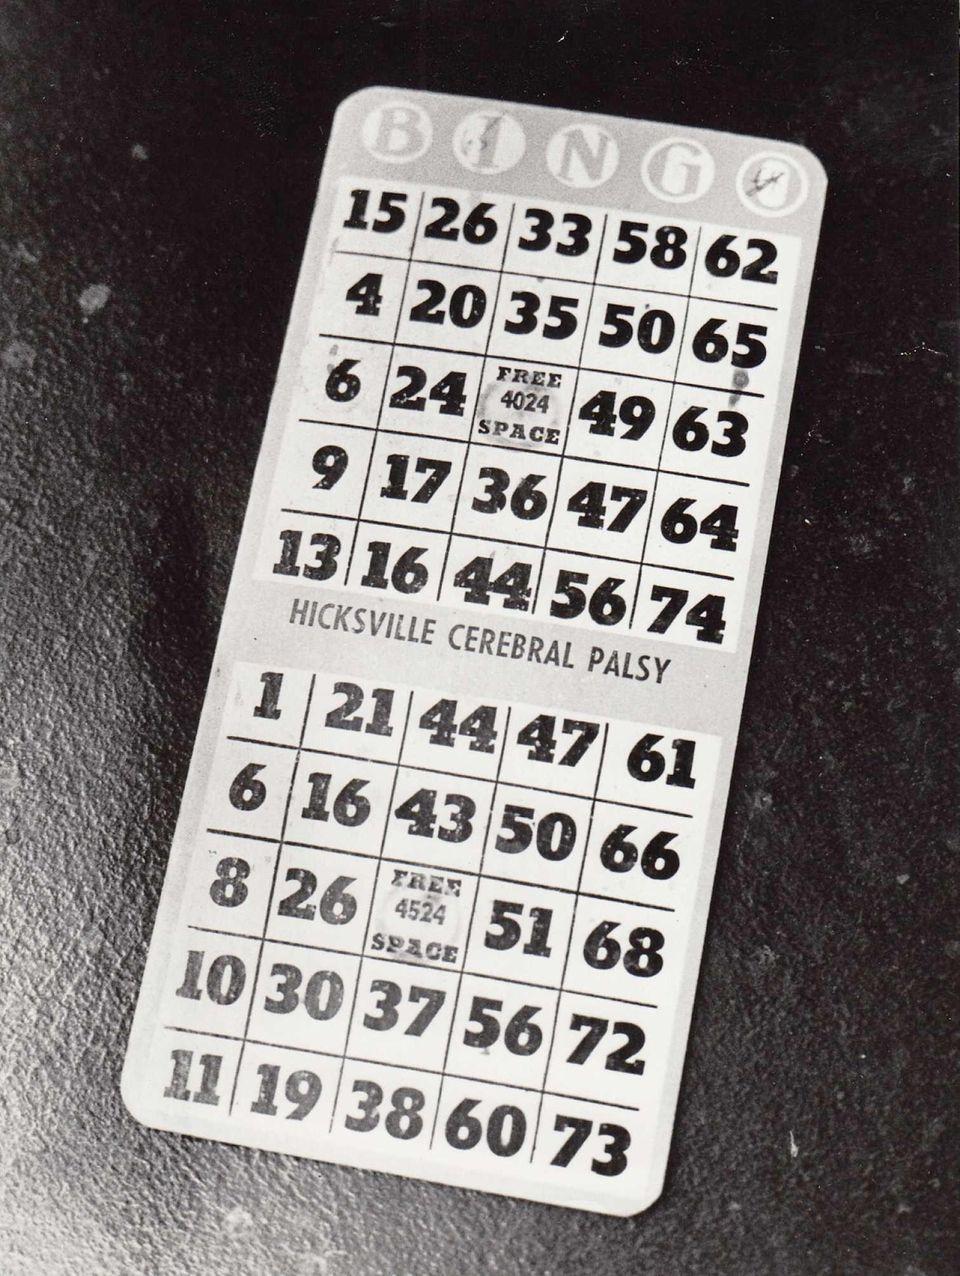 Bingo card from the Lion's Den Bingo Hall